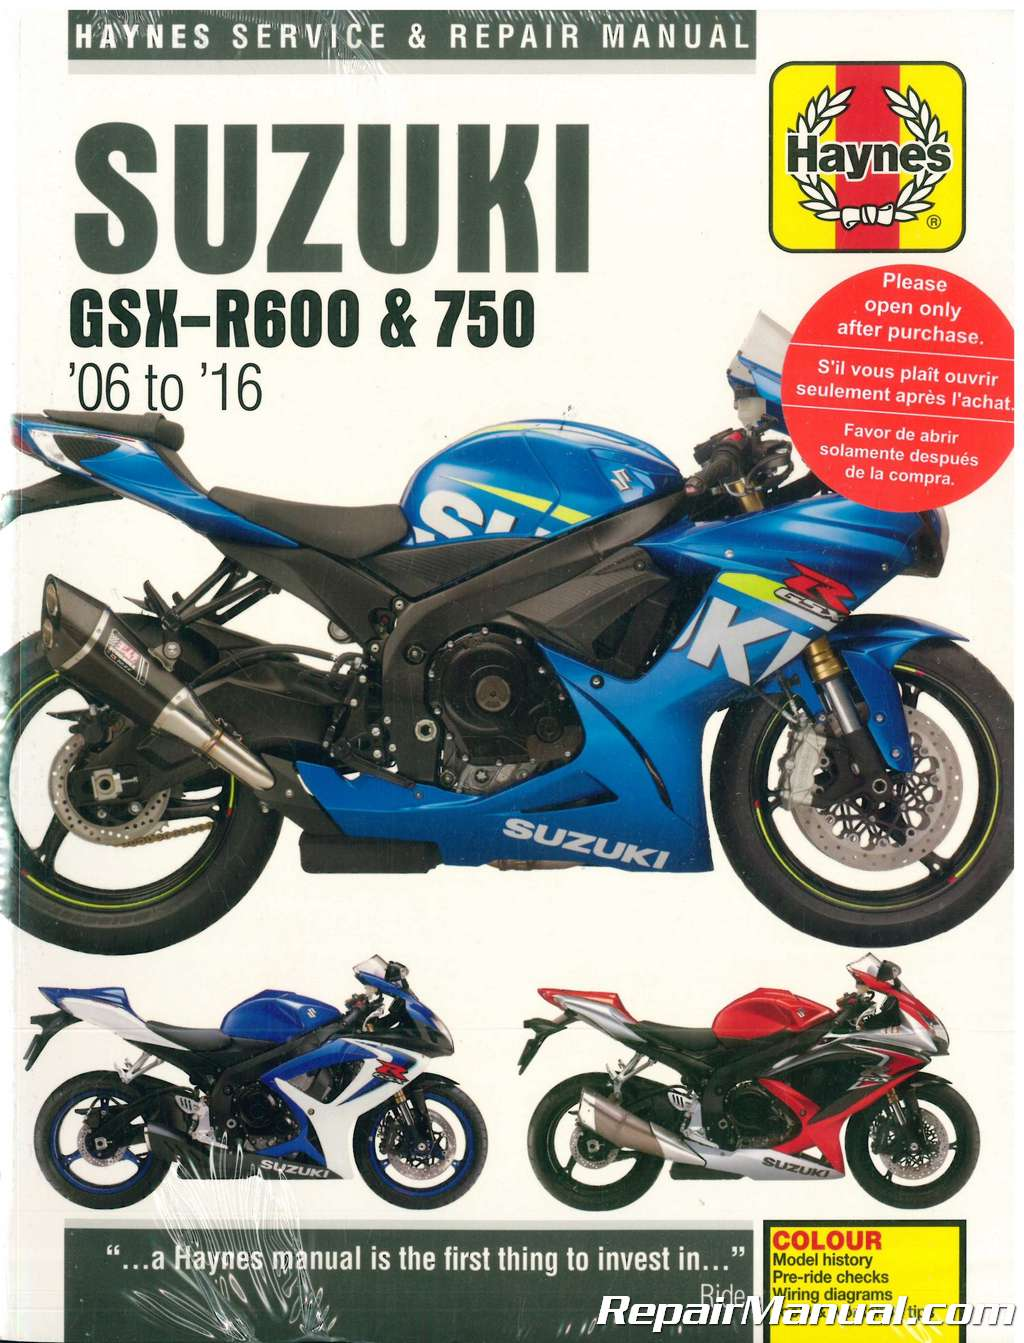 Haynes 2006 2016 Suzuki Gsx R600 R750 Motorcycle Repair Manual Wiring Diagrams